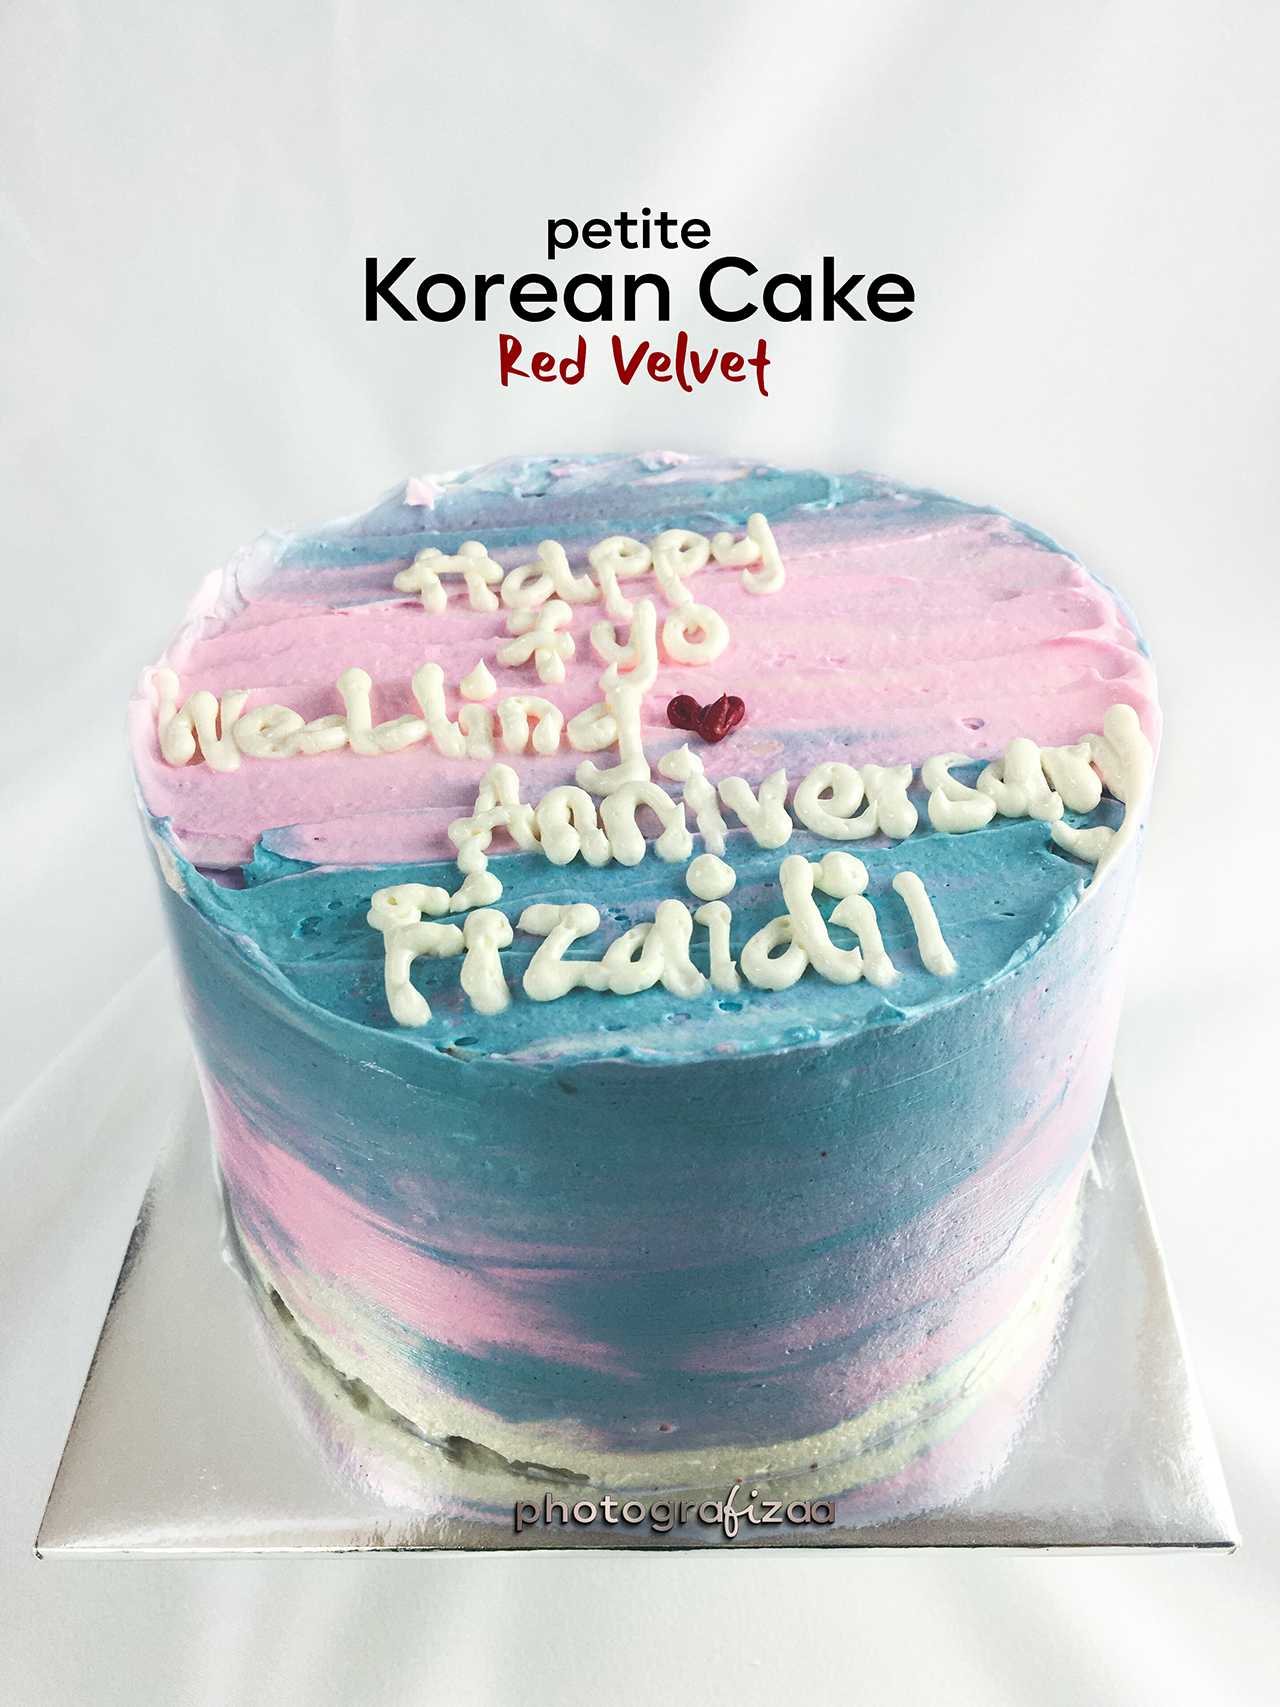 Petite Korean Cake